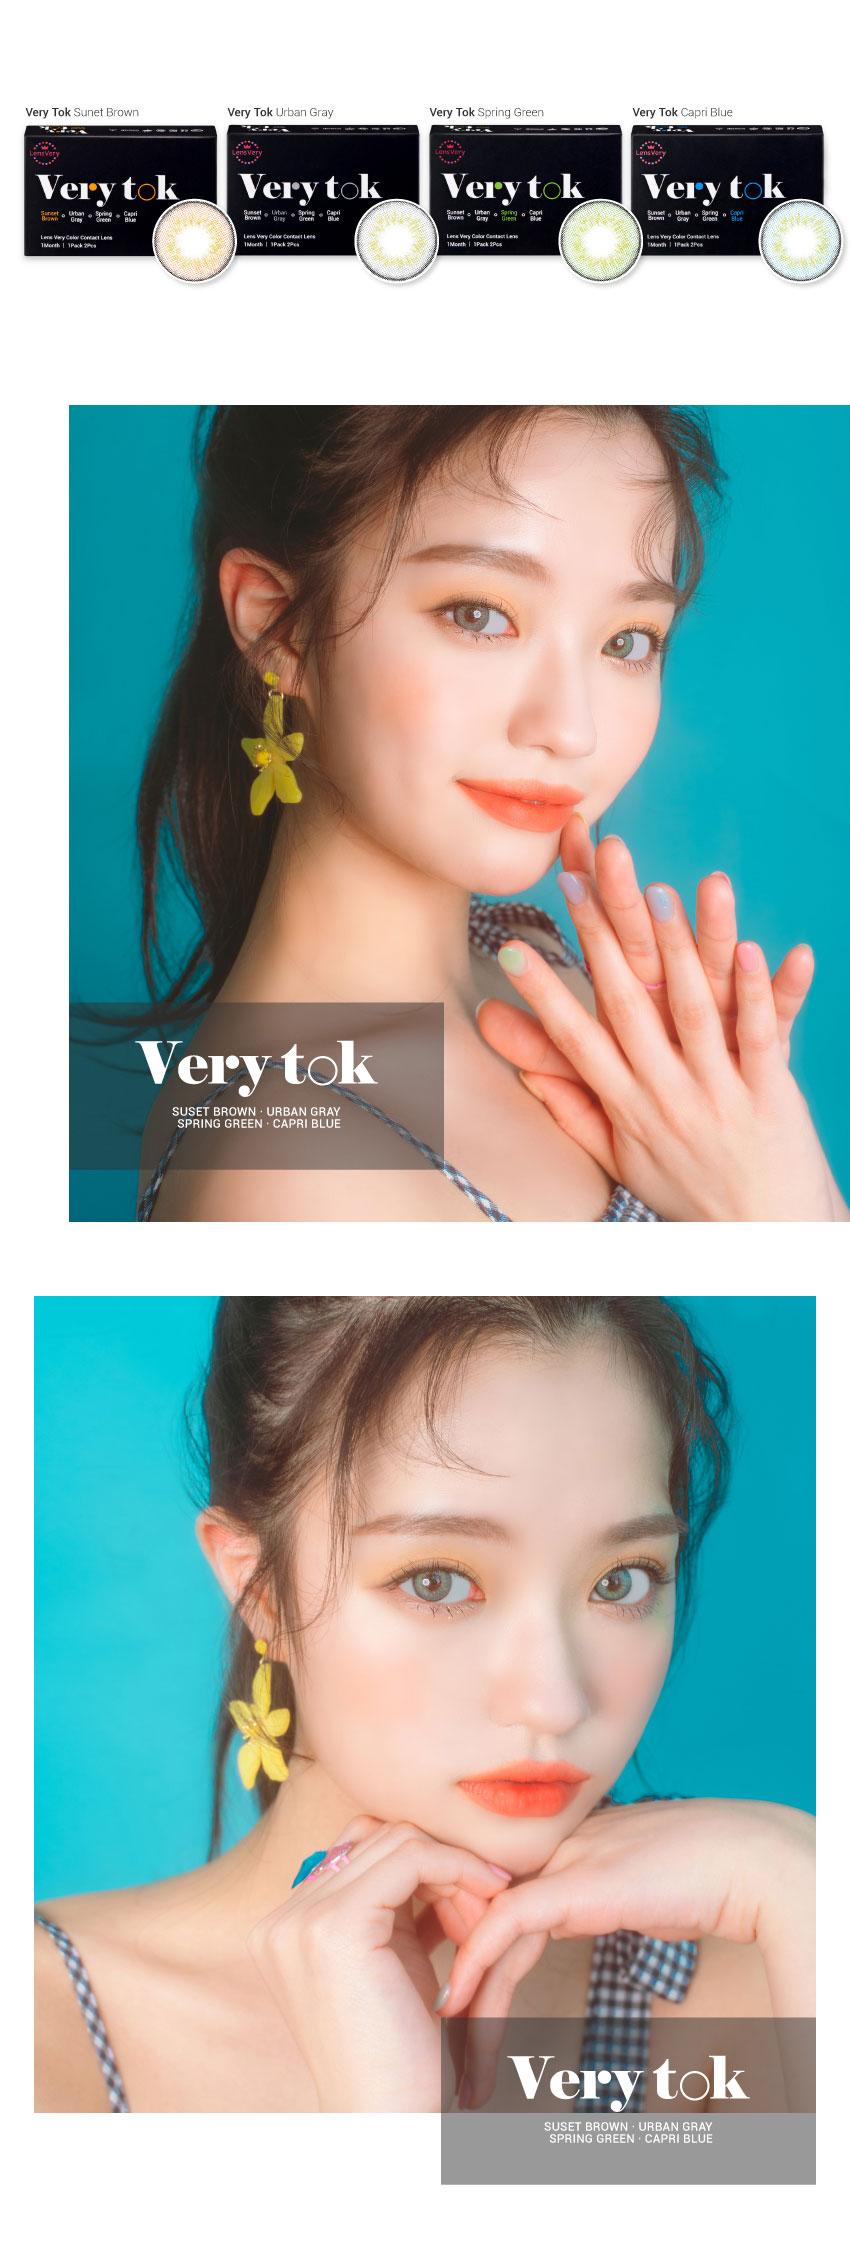 verytok-new2-2.jpg